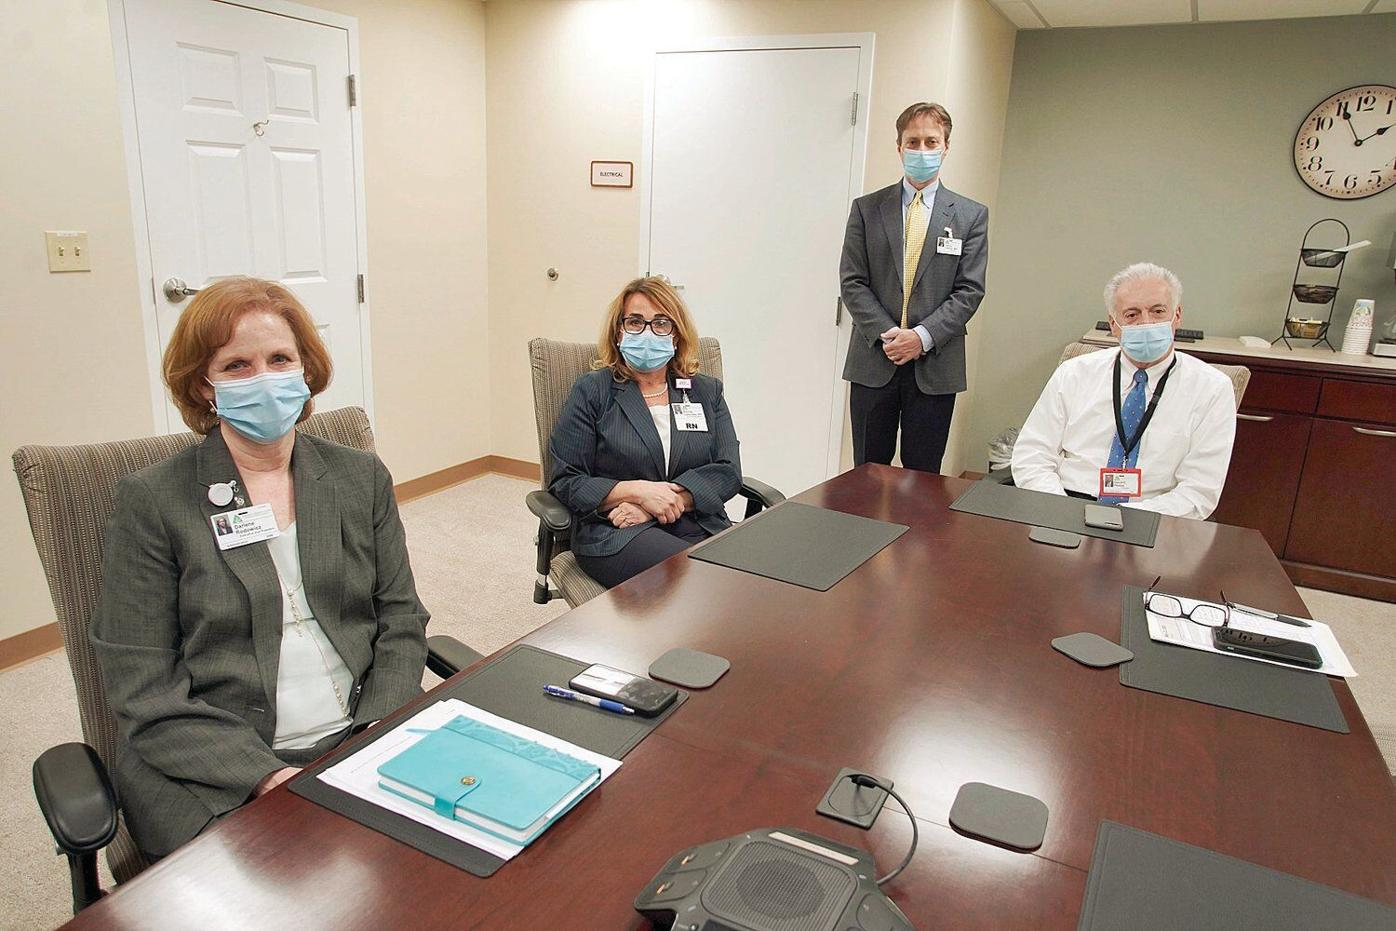 BHS executives at table